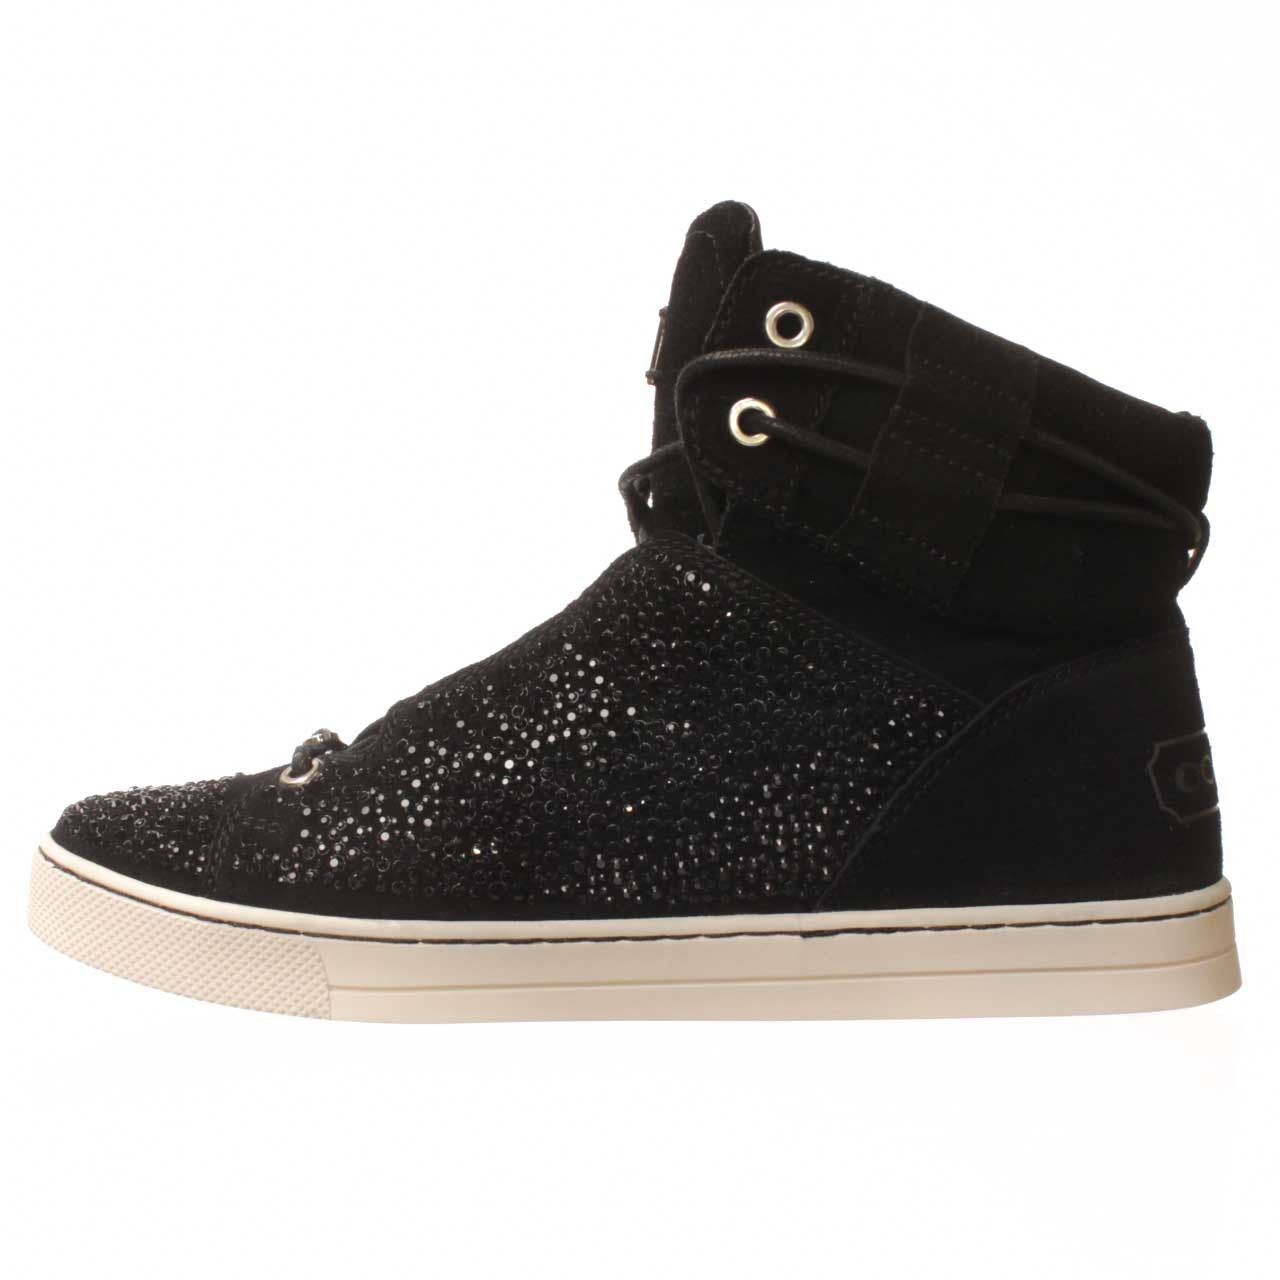 Coach Penda Fashion Sneaker in Black   Lyst